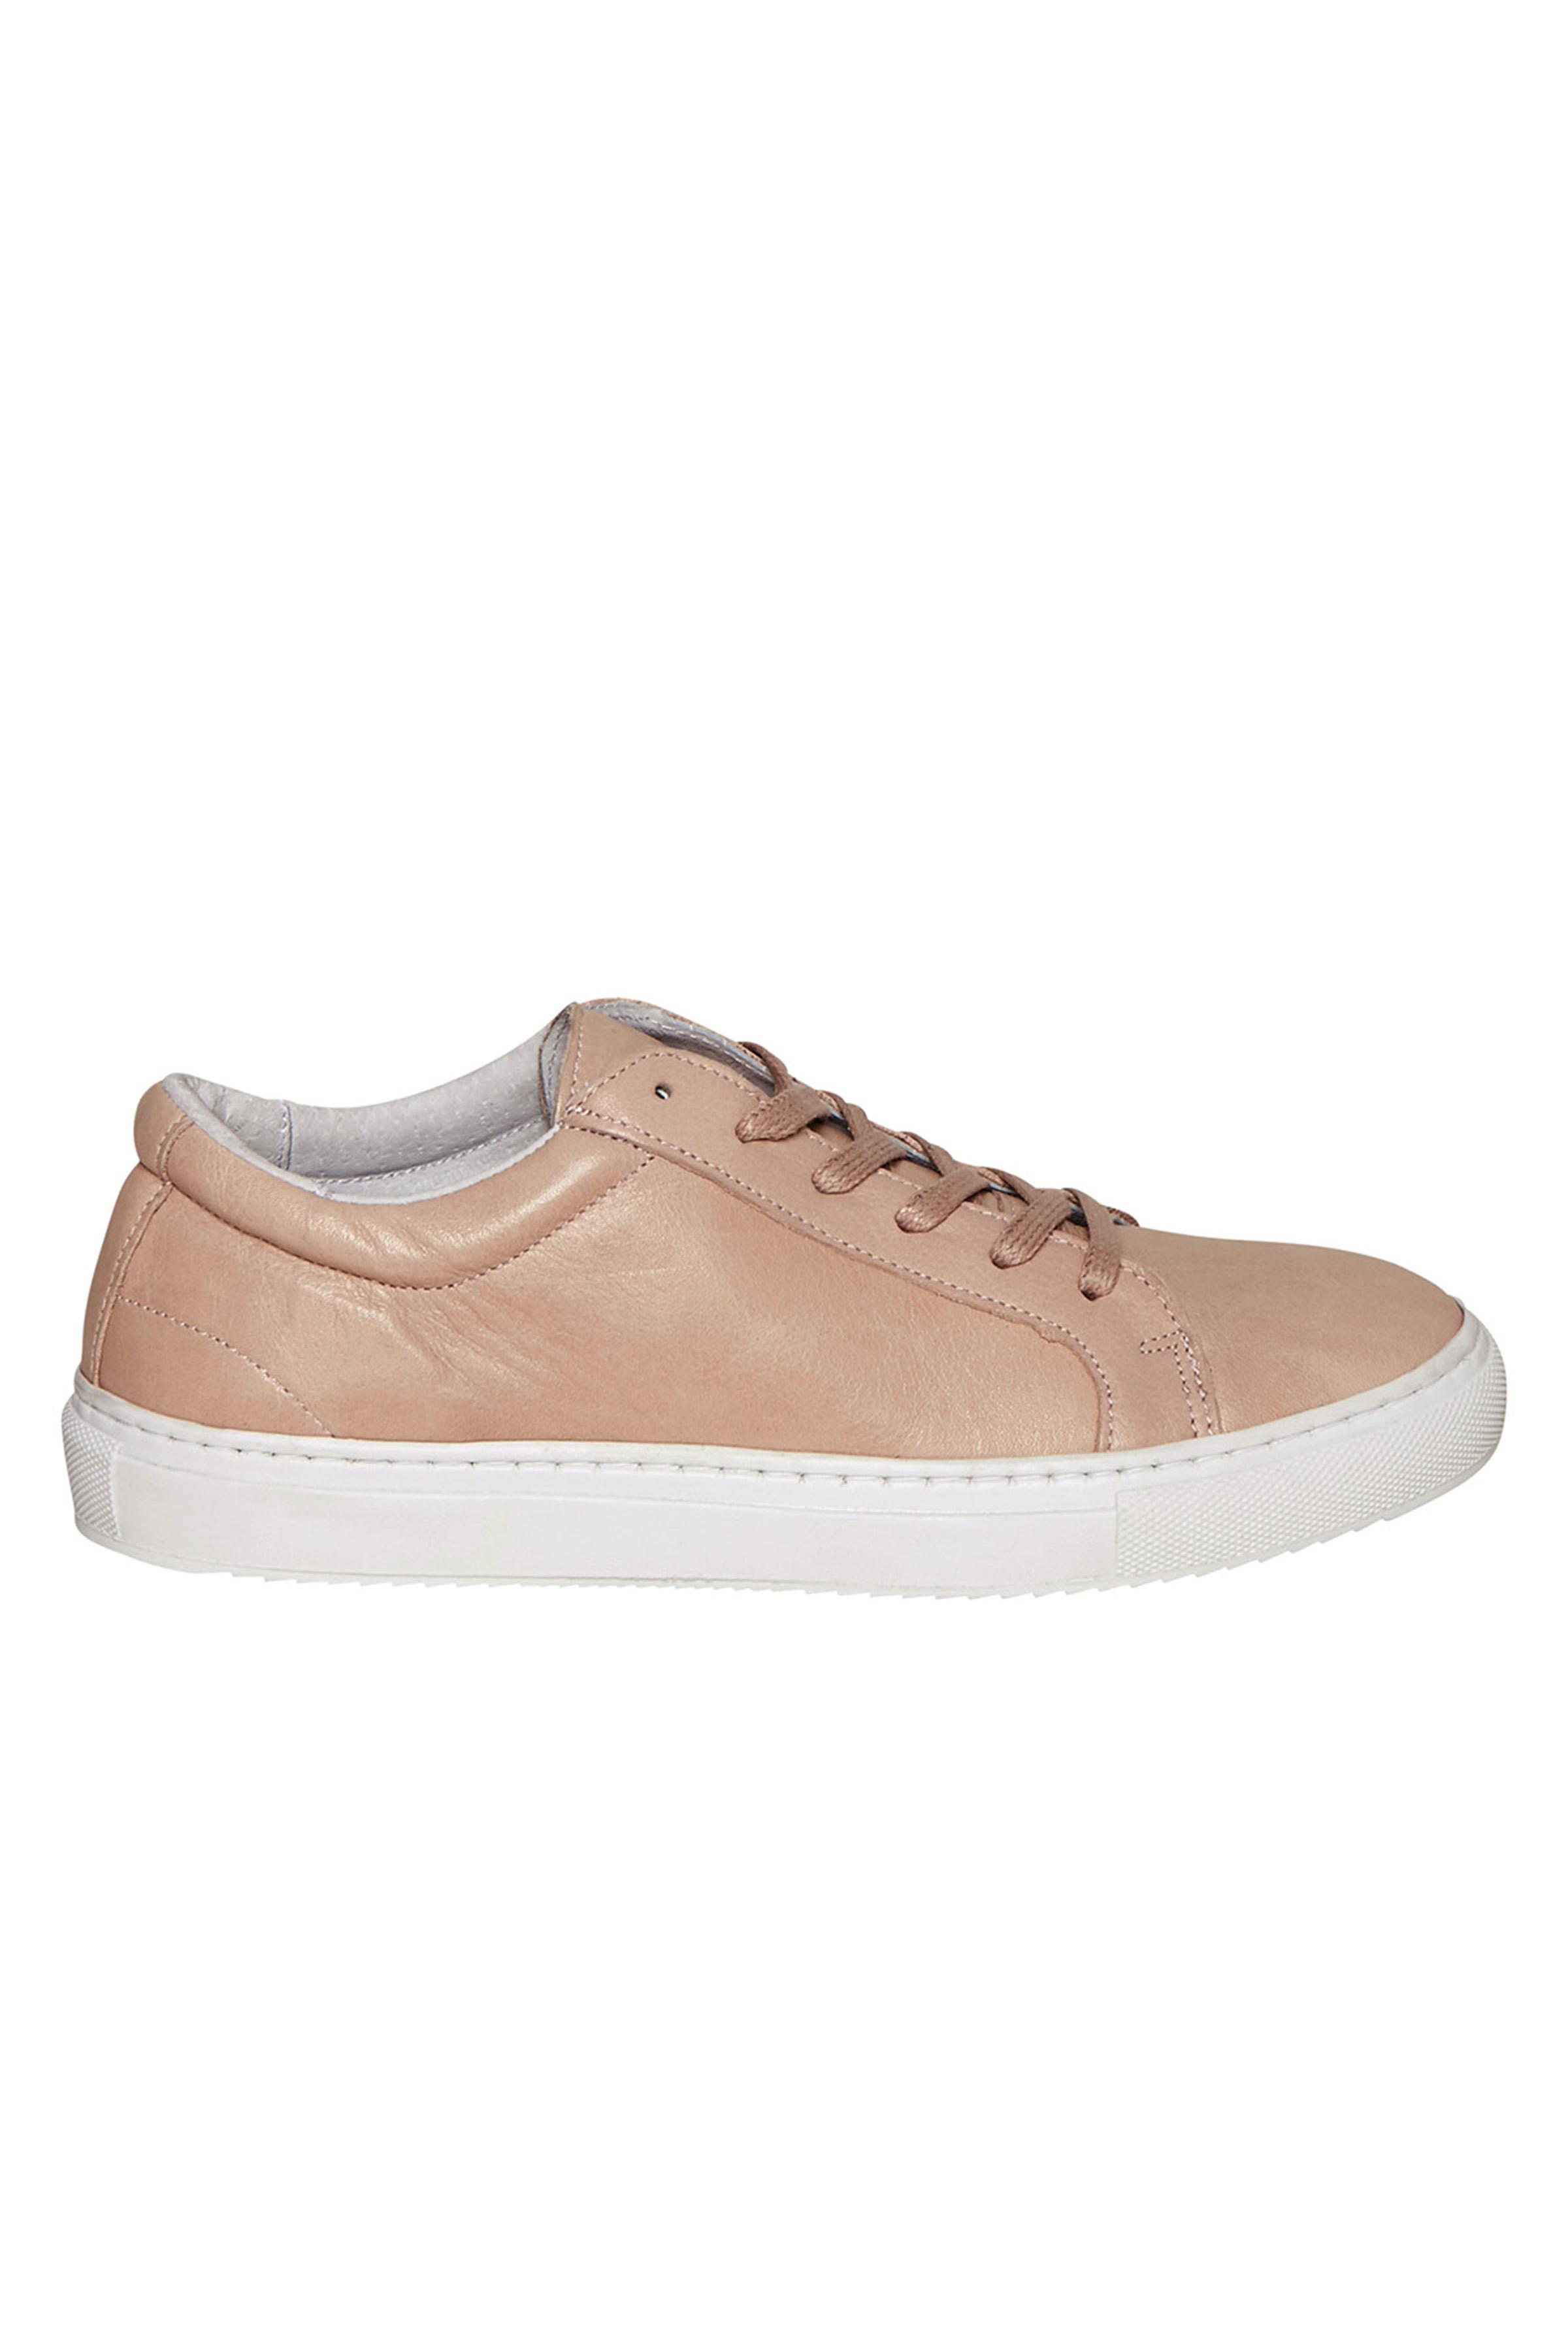 Ichi - accessories Dame Super cool sneakers  - Nougat